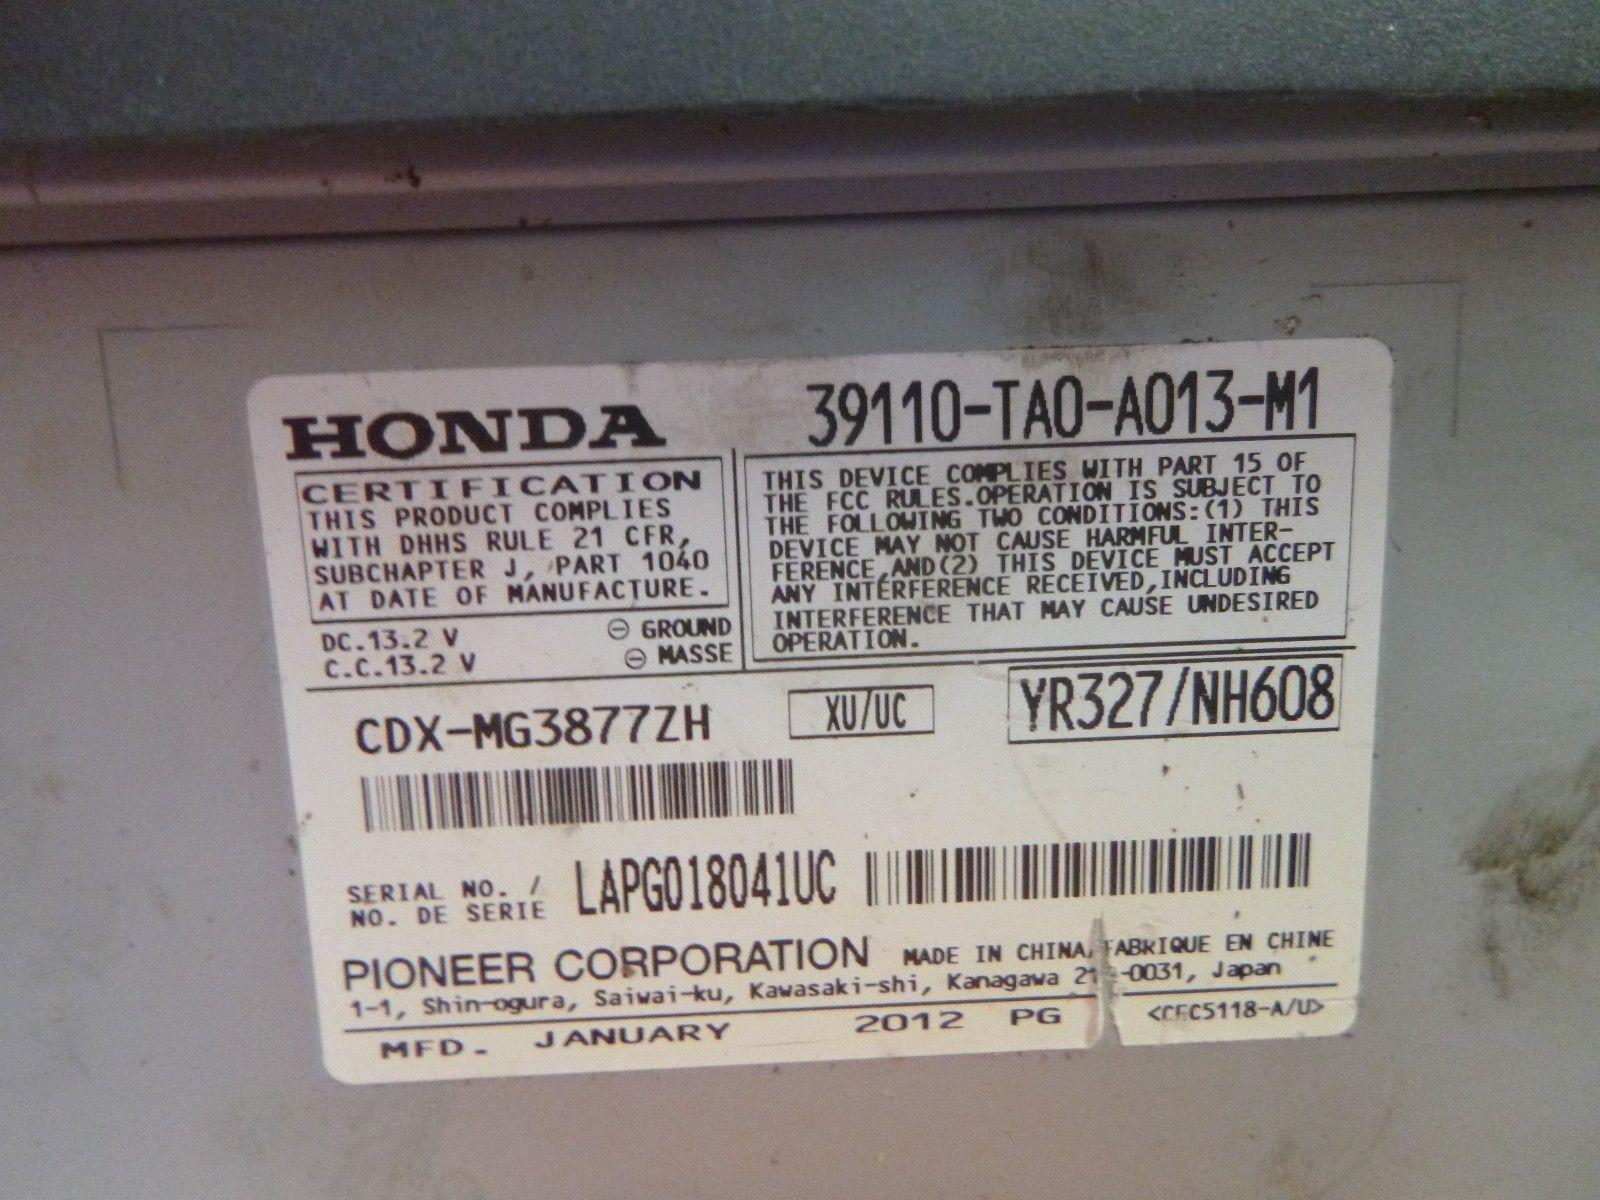 08 09 10 11 12 Honda Accord Premium Remote 6 Cd Player 39110-TA0-A013 KB640